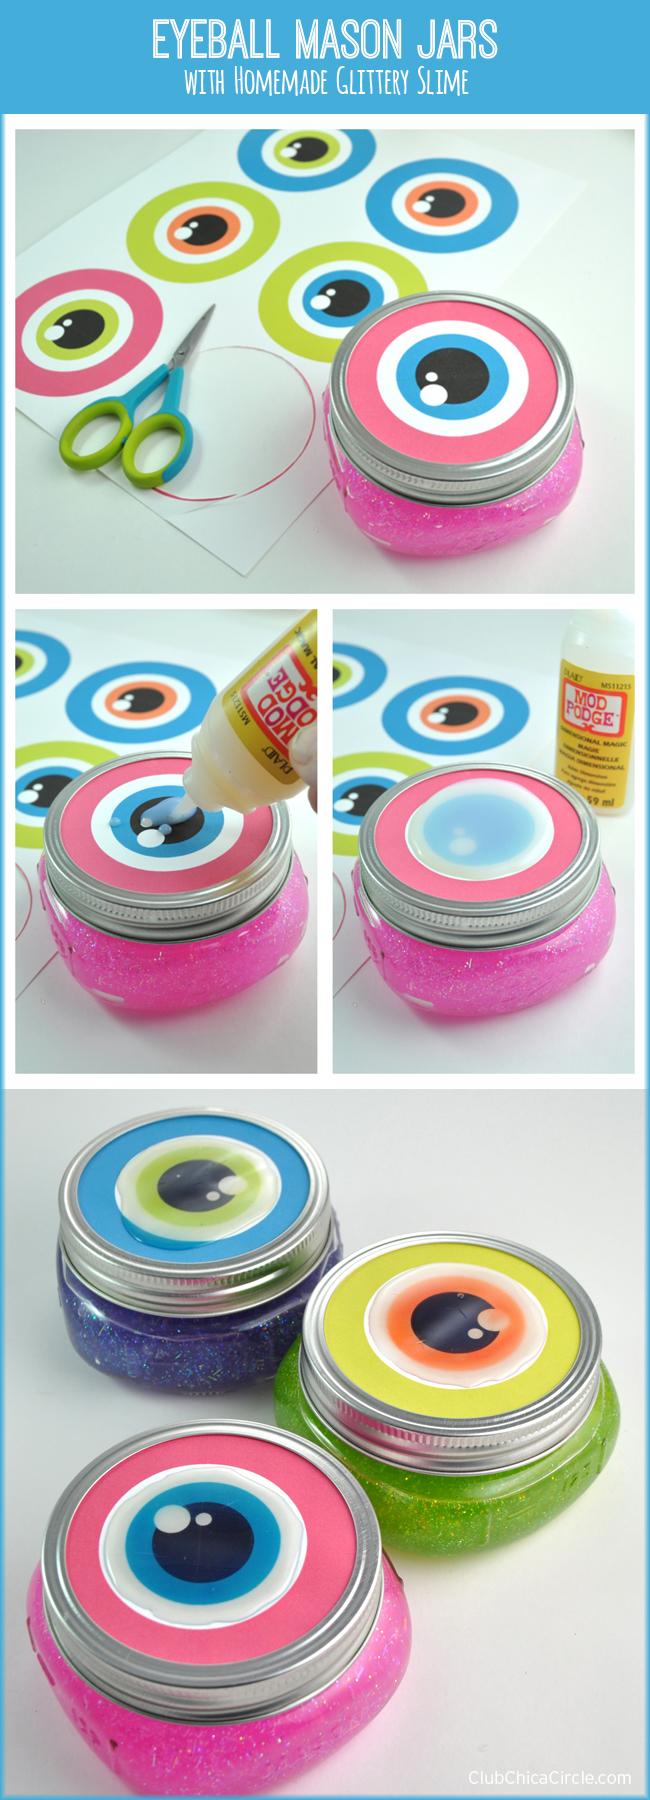 Eyeball Mason Jars Craft Idea with Homemade Glitter Slime